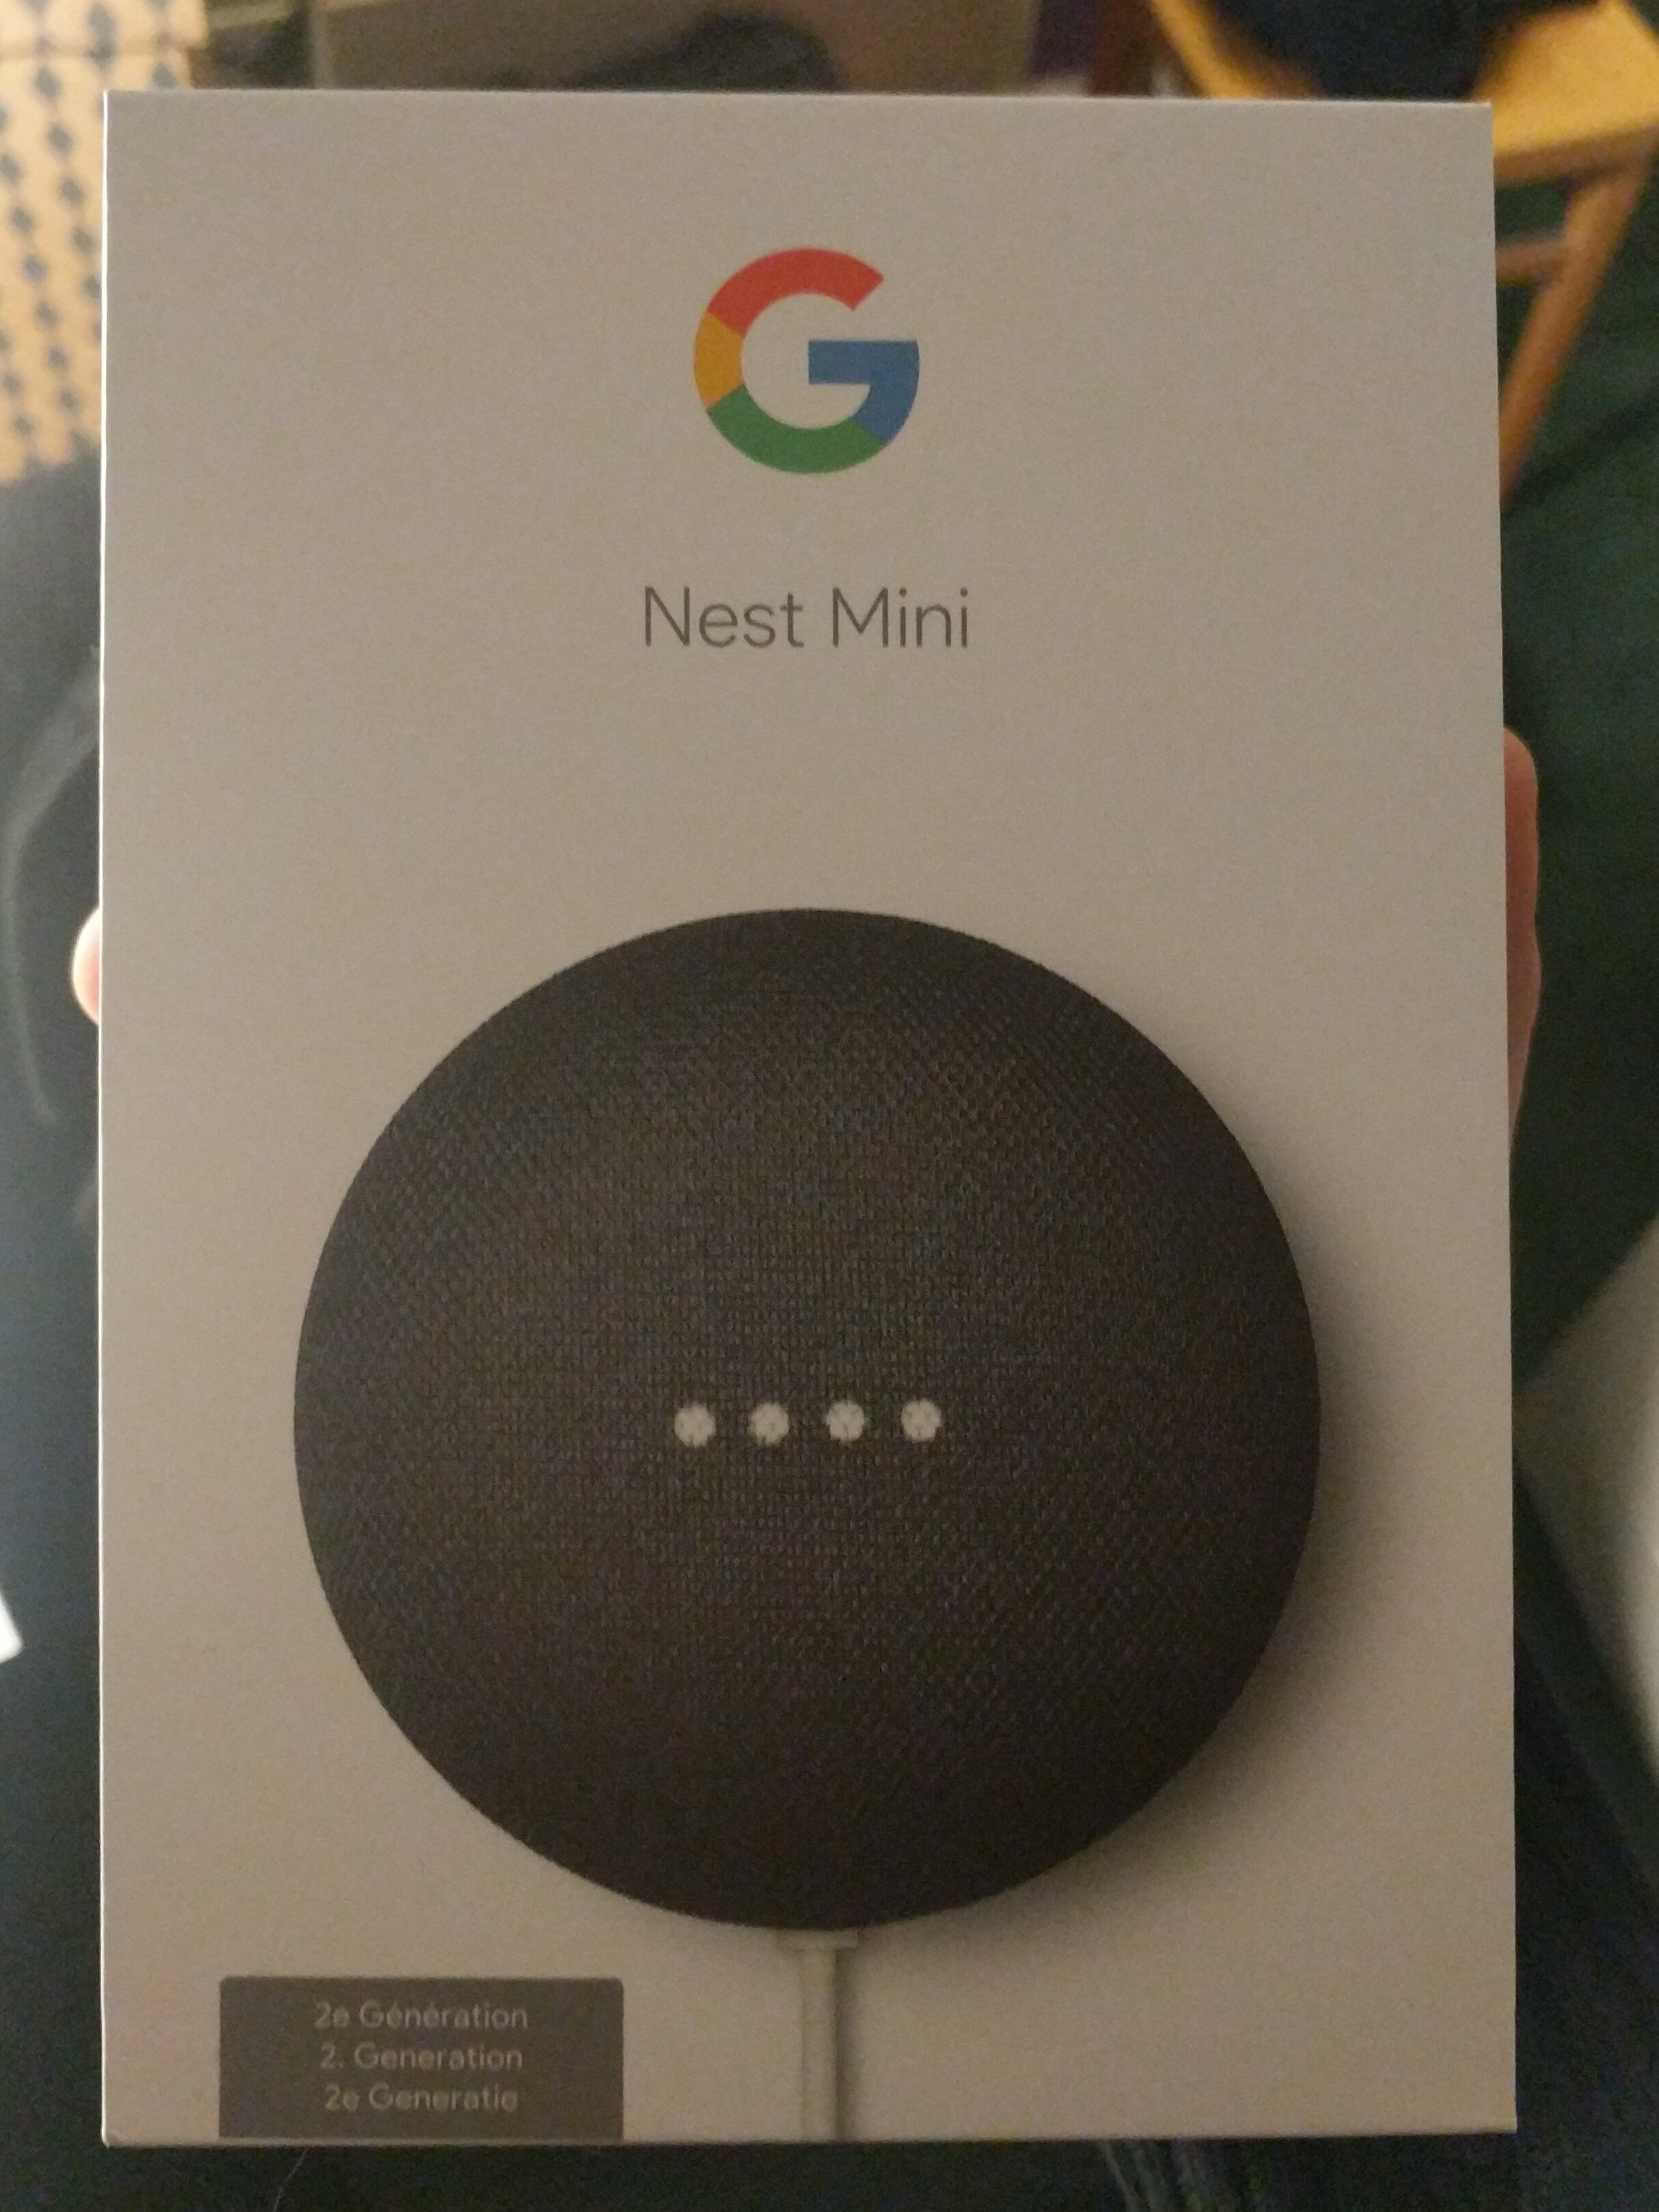 Nest Mini 2. Generation - Product - en